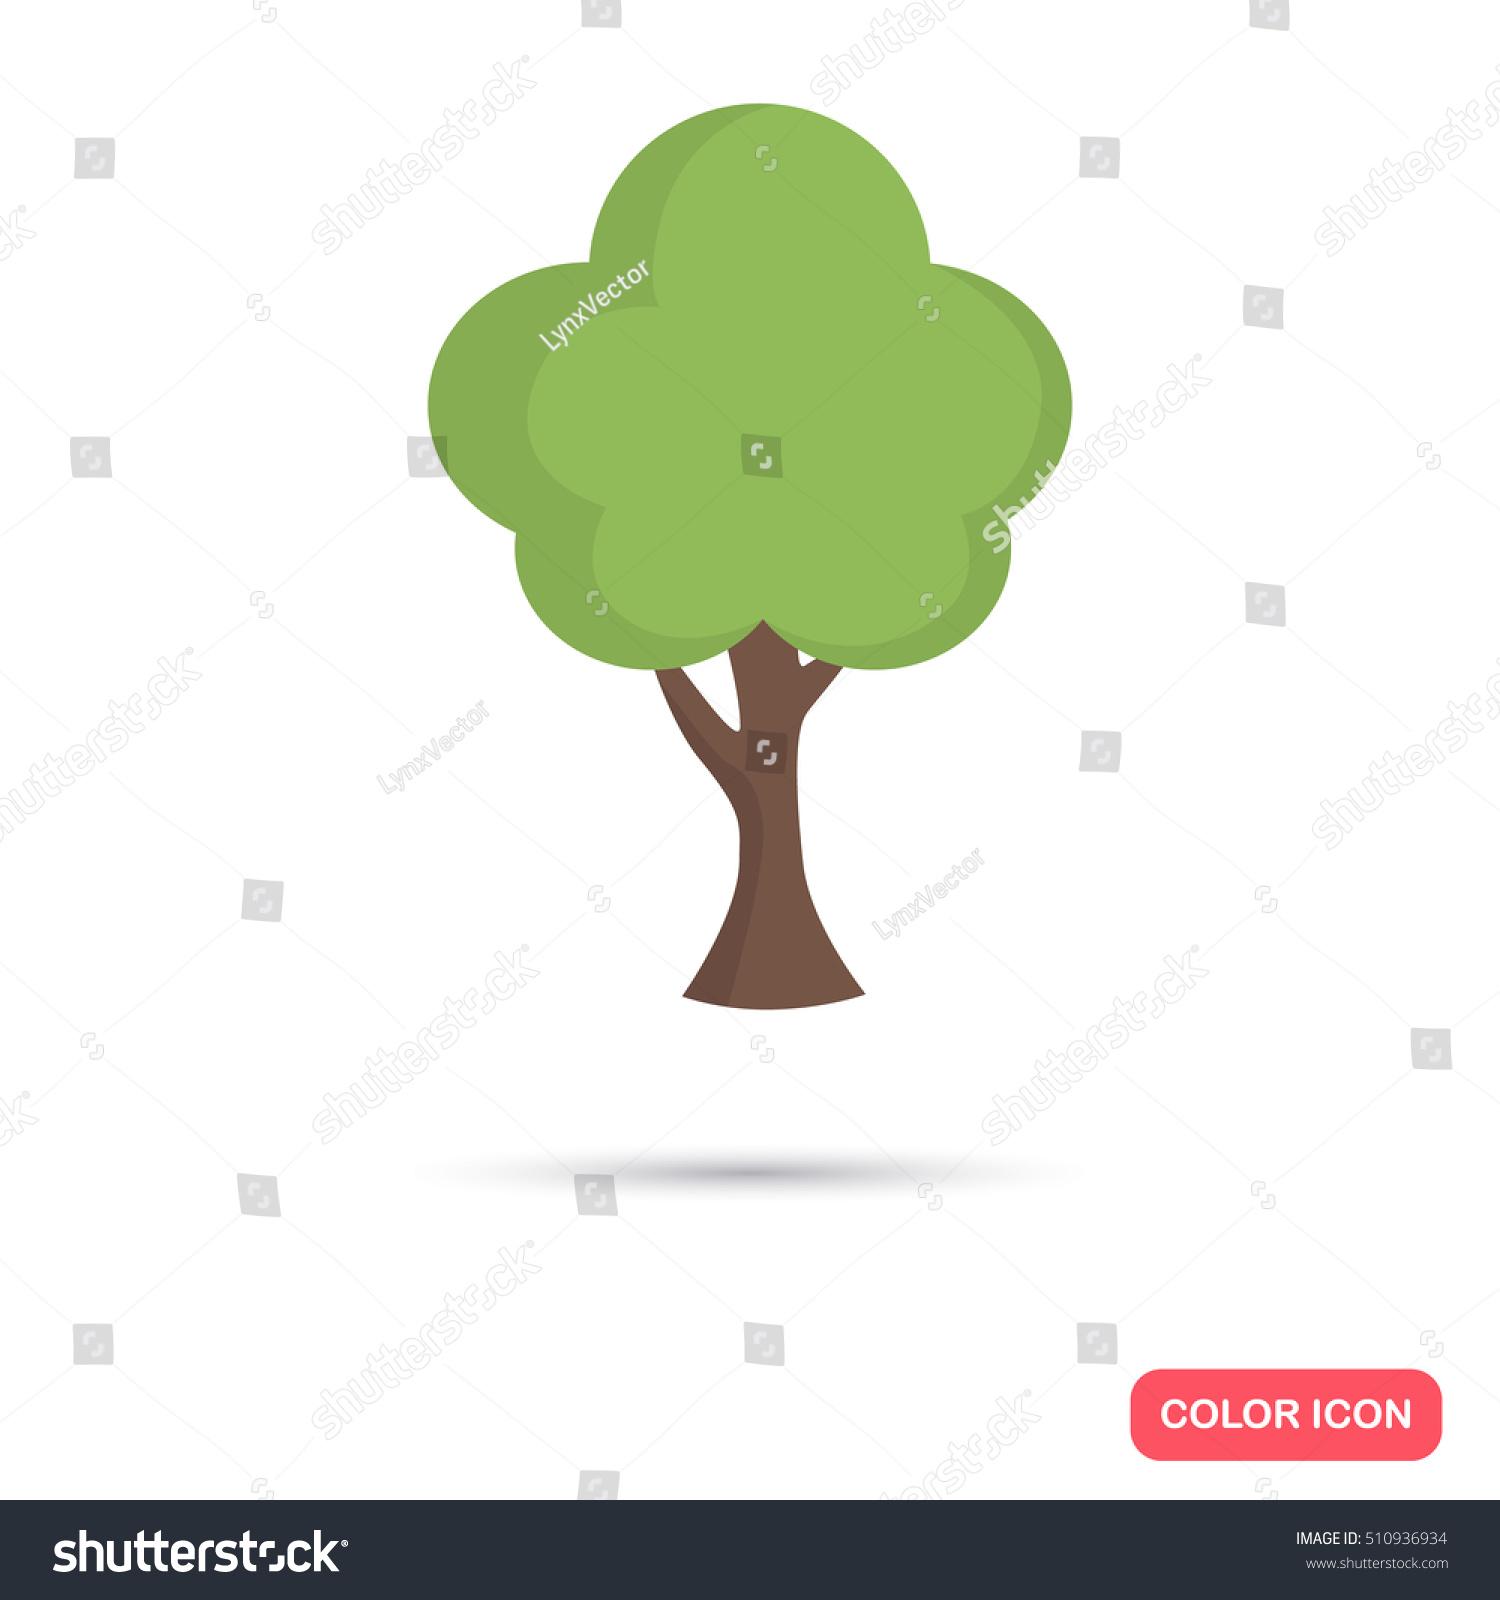 Green Tree Color Icon Flat Design Stock Vector 510936934 - Shutterstock